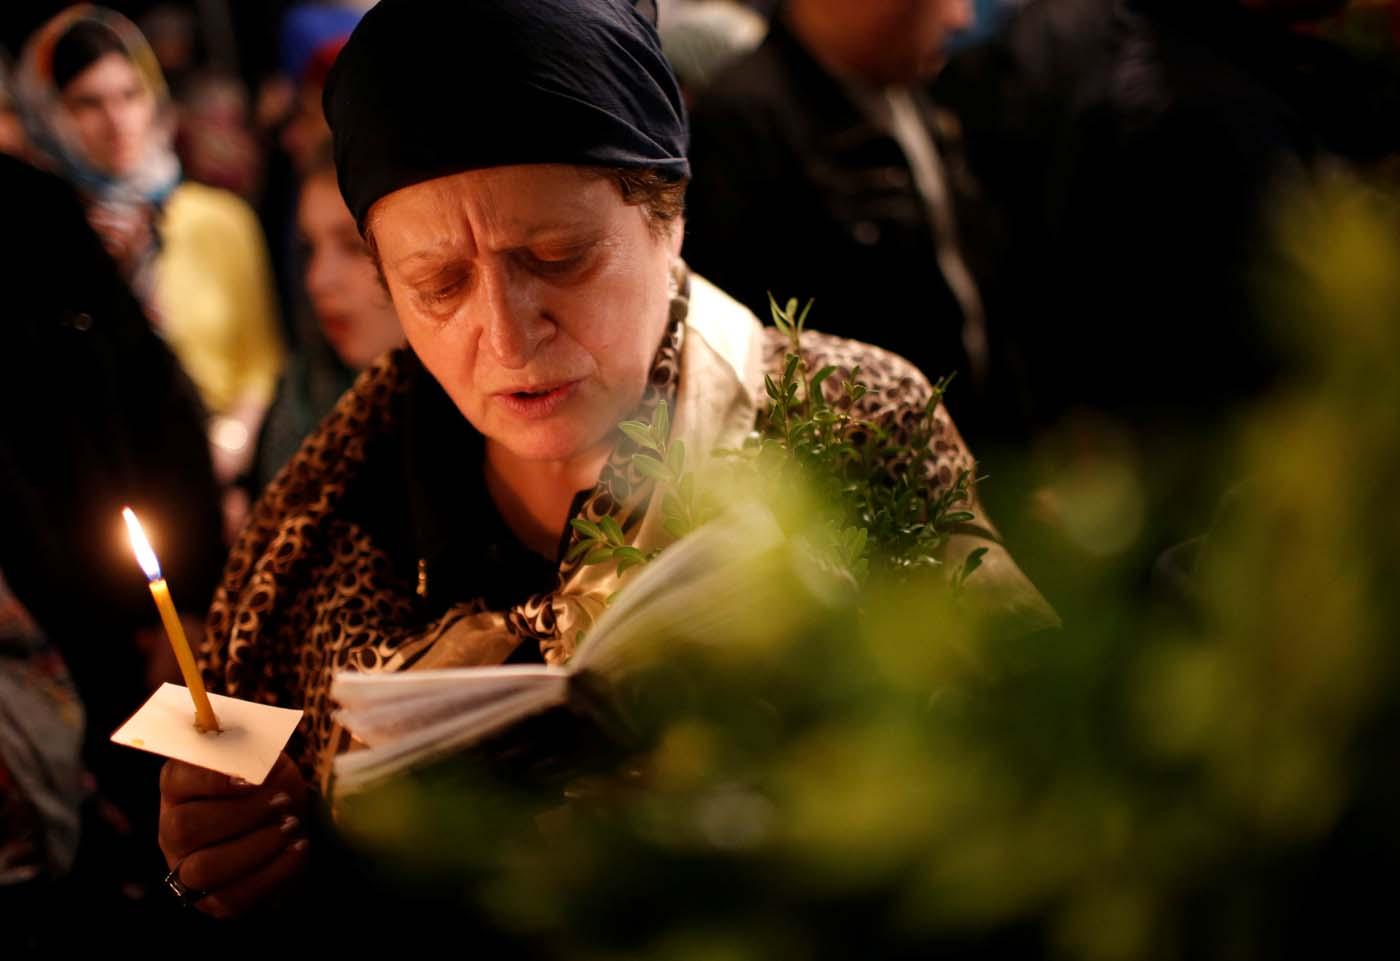 A woman reads a prayer book during the Palm Sunday service in Tbilisi, Georgia April 9, 2017. REUTERS/David Mdzinarishvili